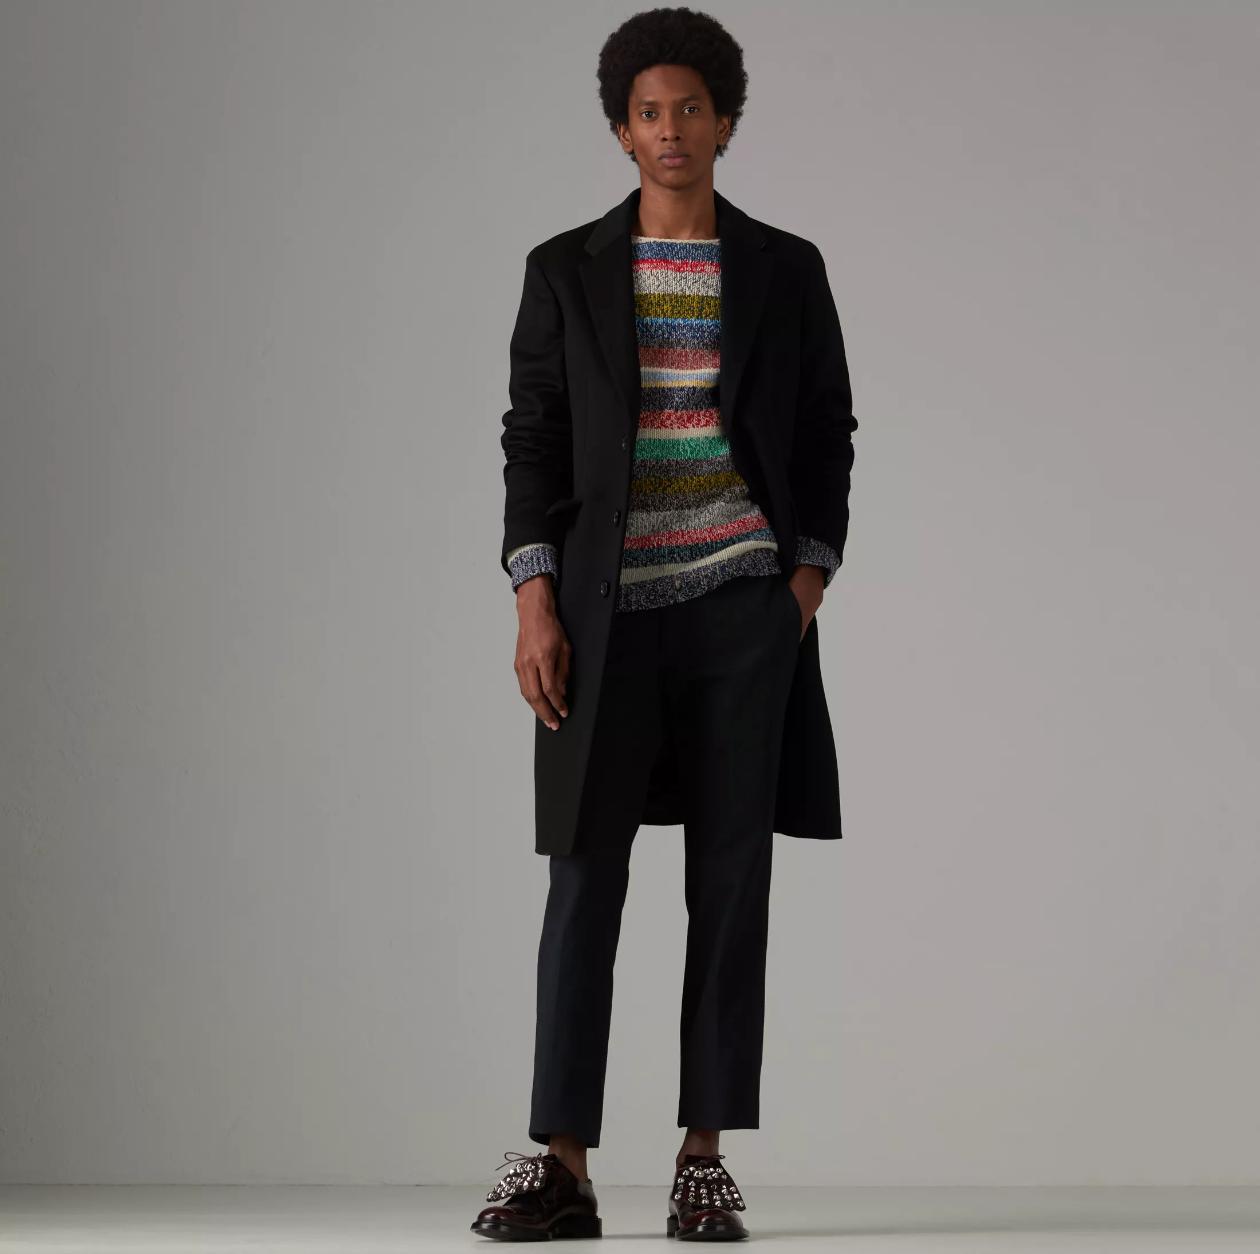 TheHoundsBlogMedia_BestMenswear_BurberryTailoredCoat